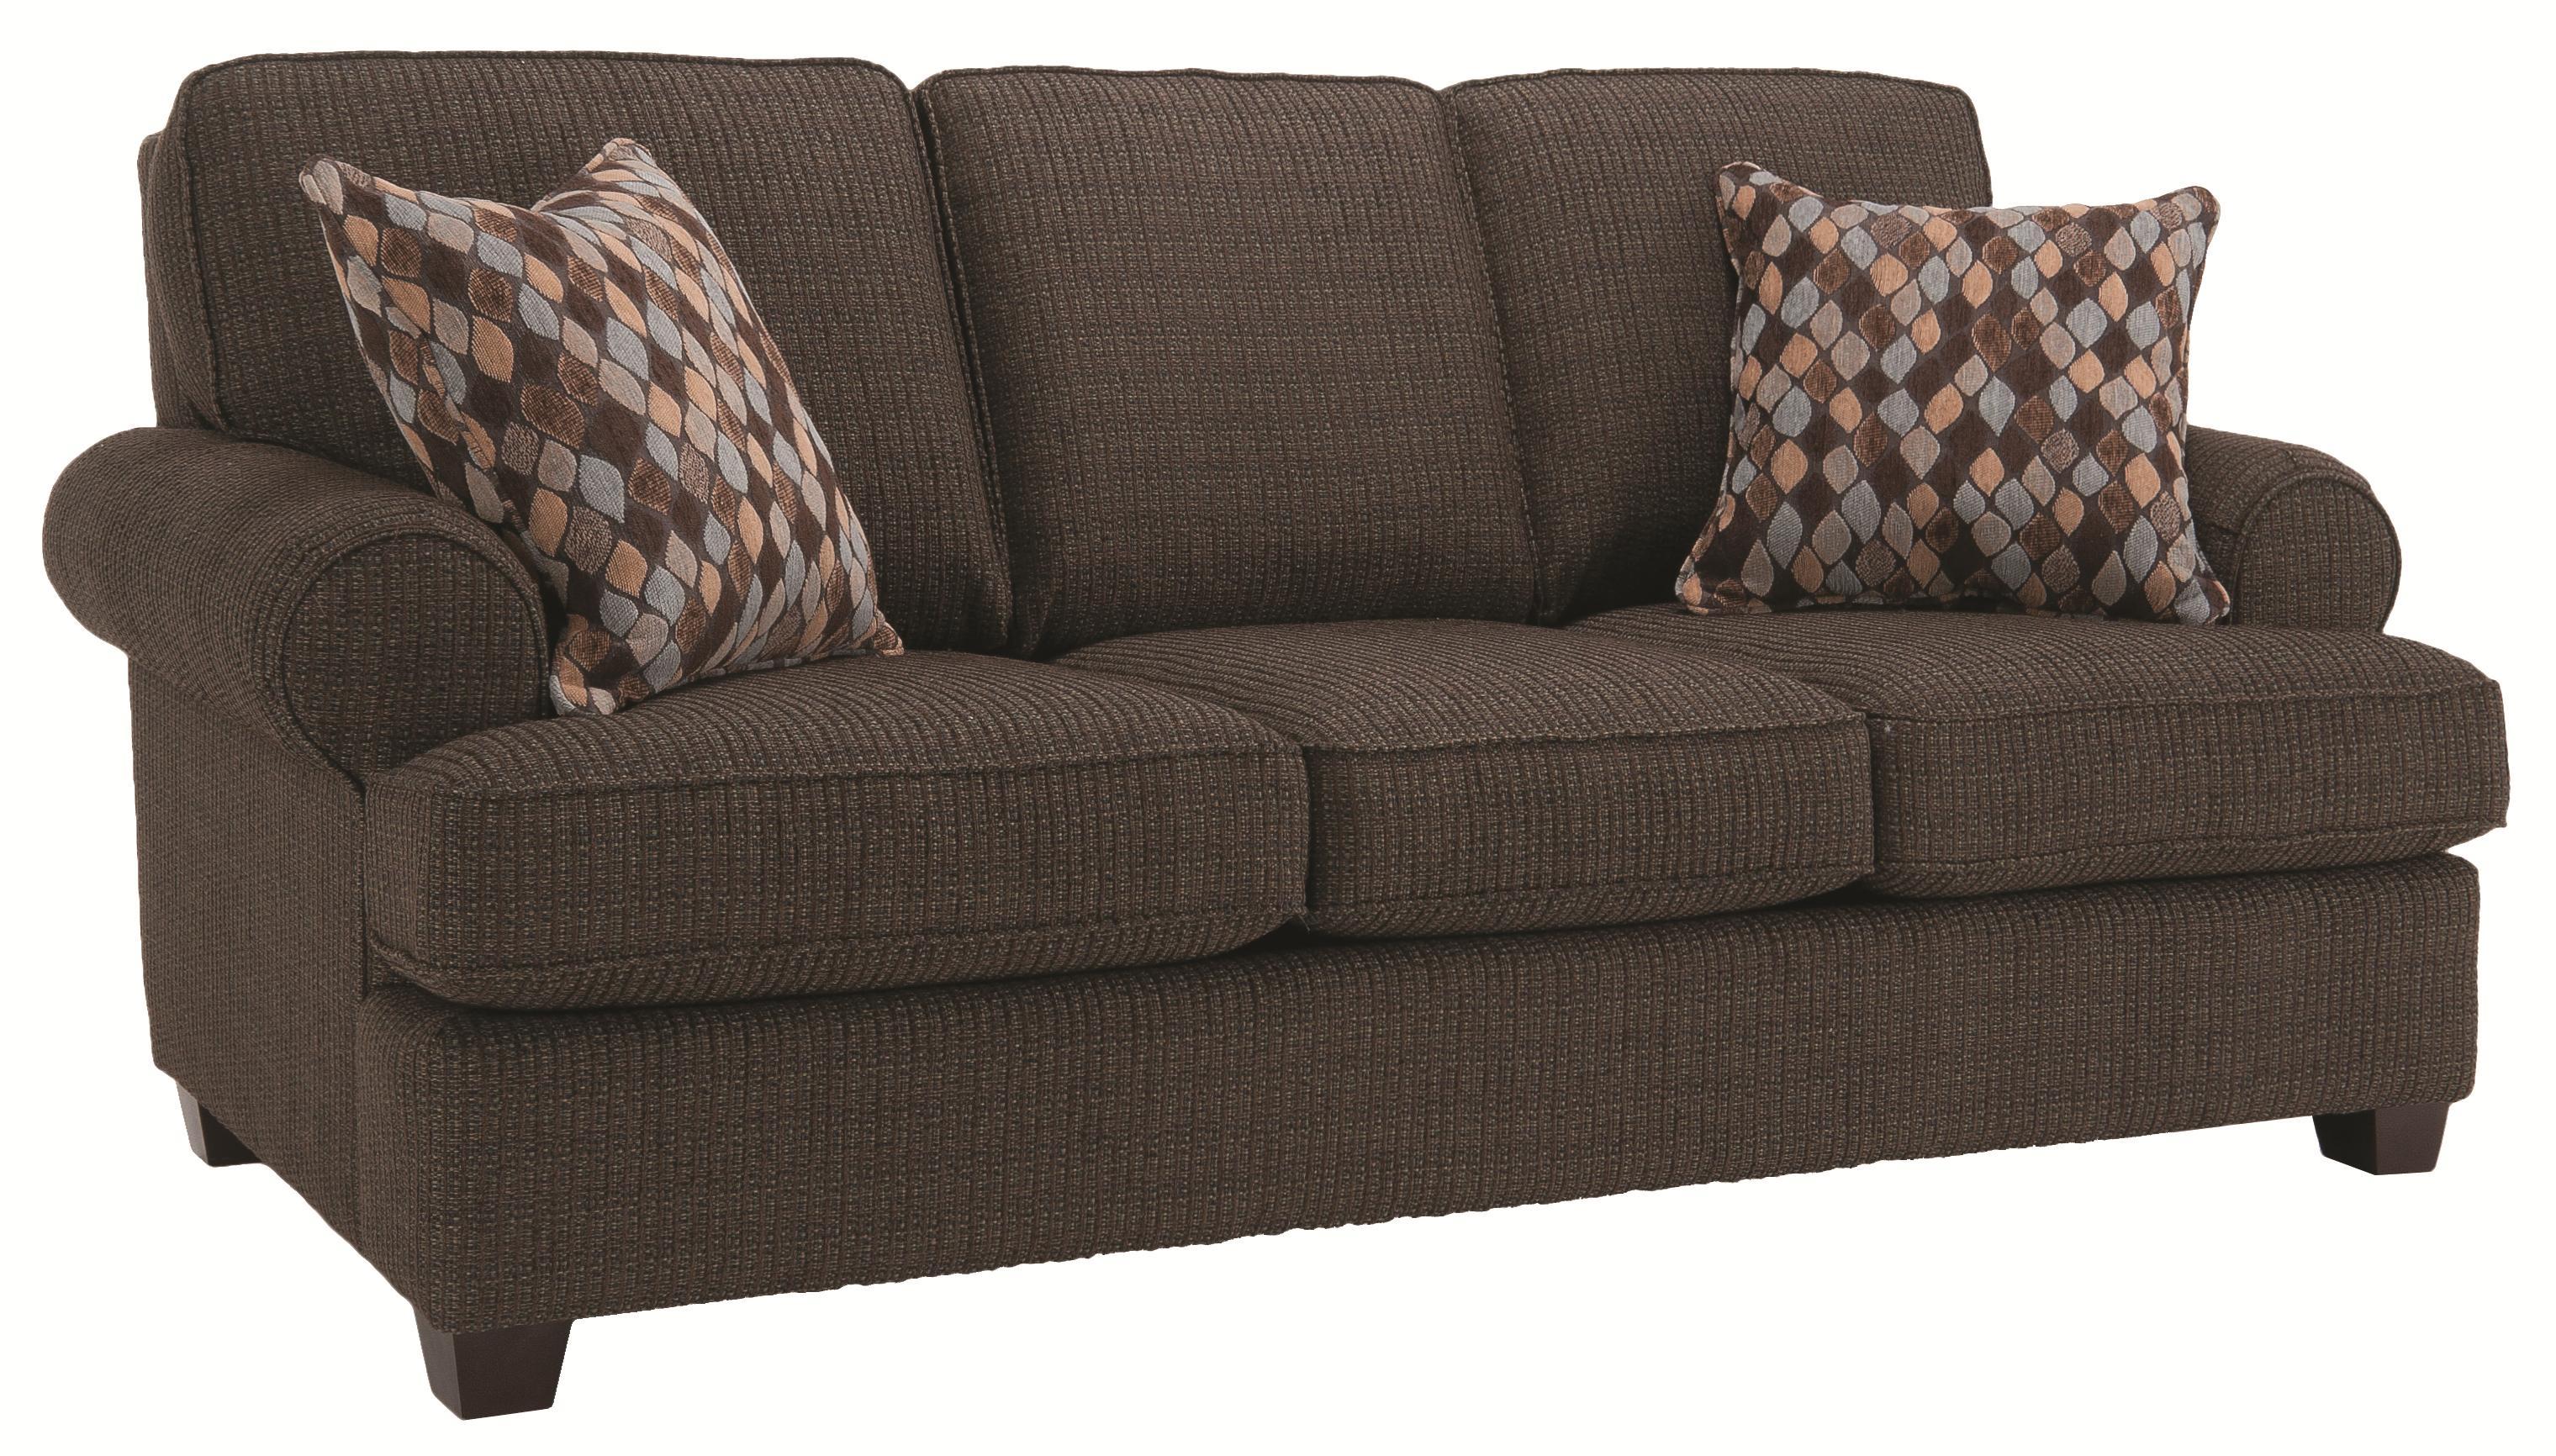 2285  Sofa by Decor-Rest at Johnny Janosik